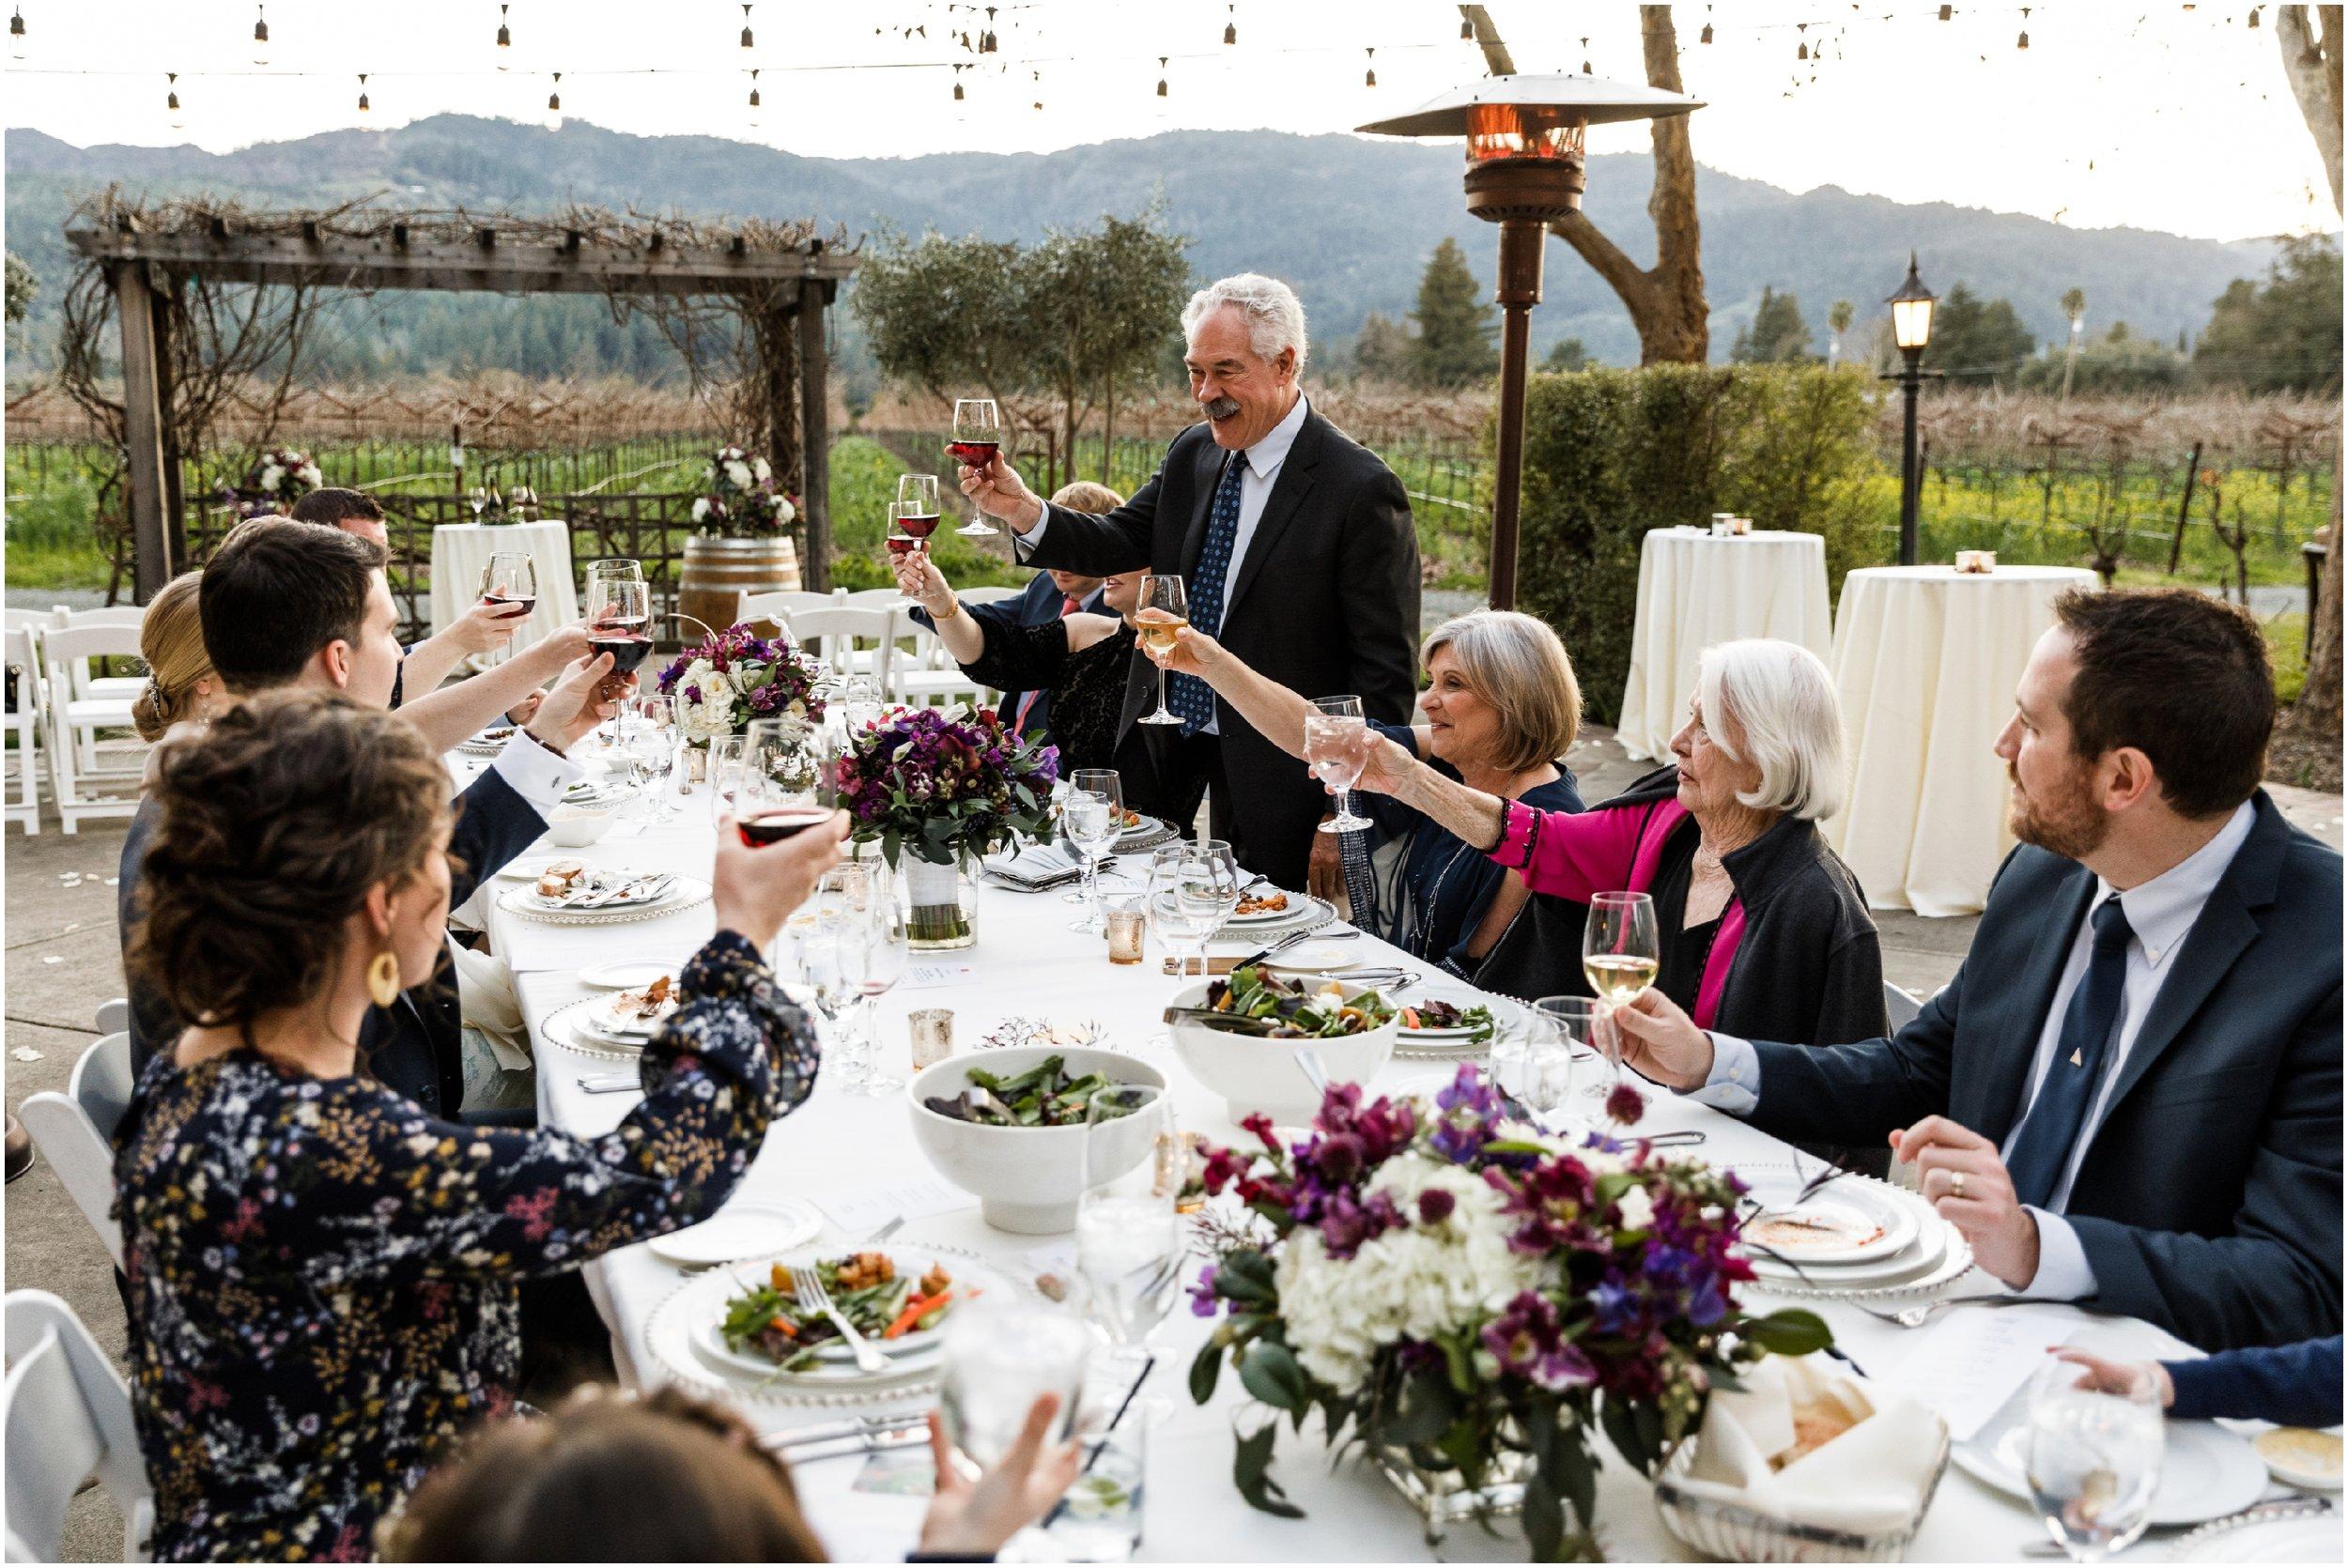 father of groom giving wedding toast